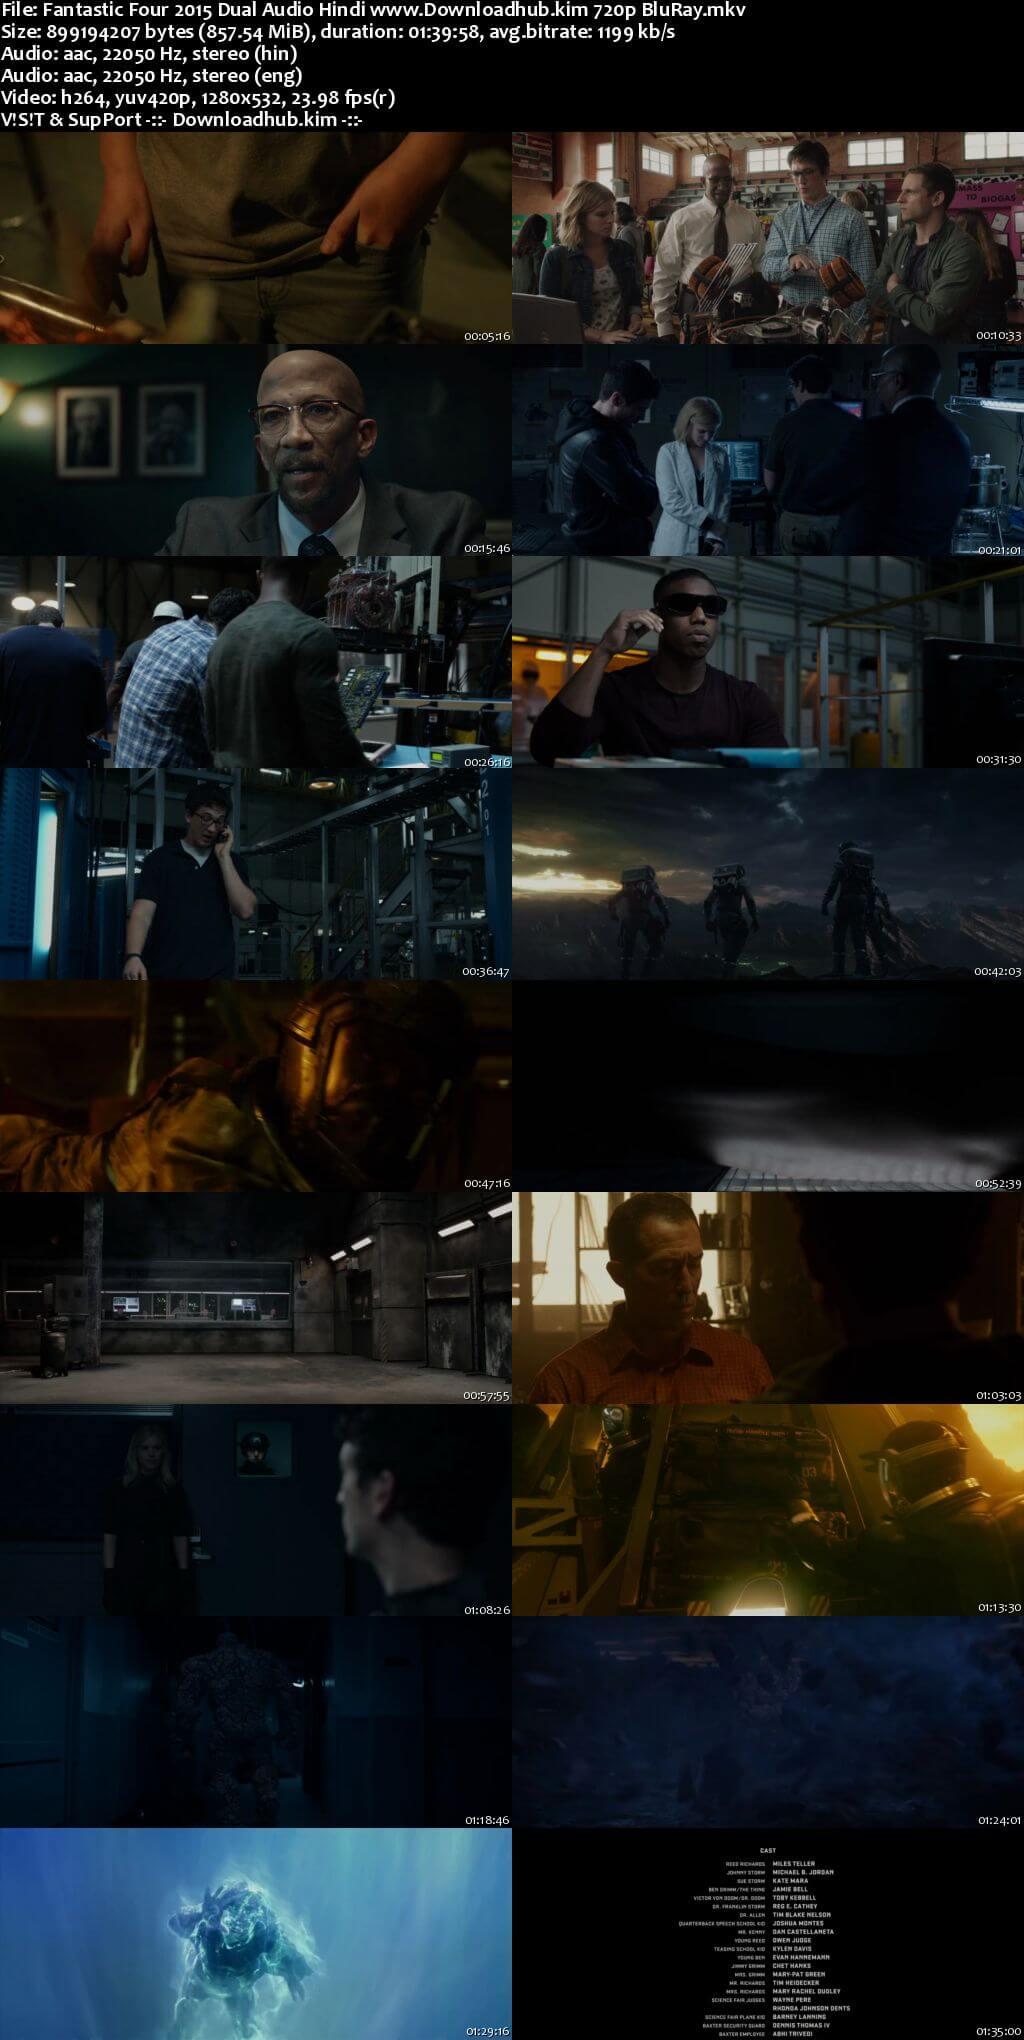 Fantastic Four 2015 Hindi Dual Audio 720p BluRay x264